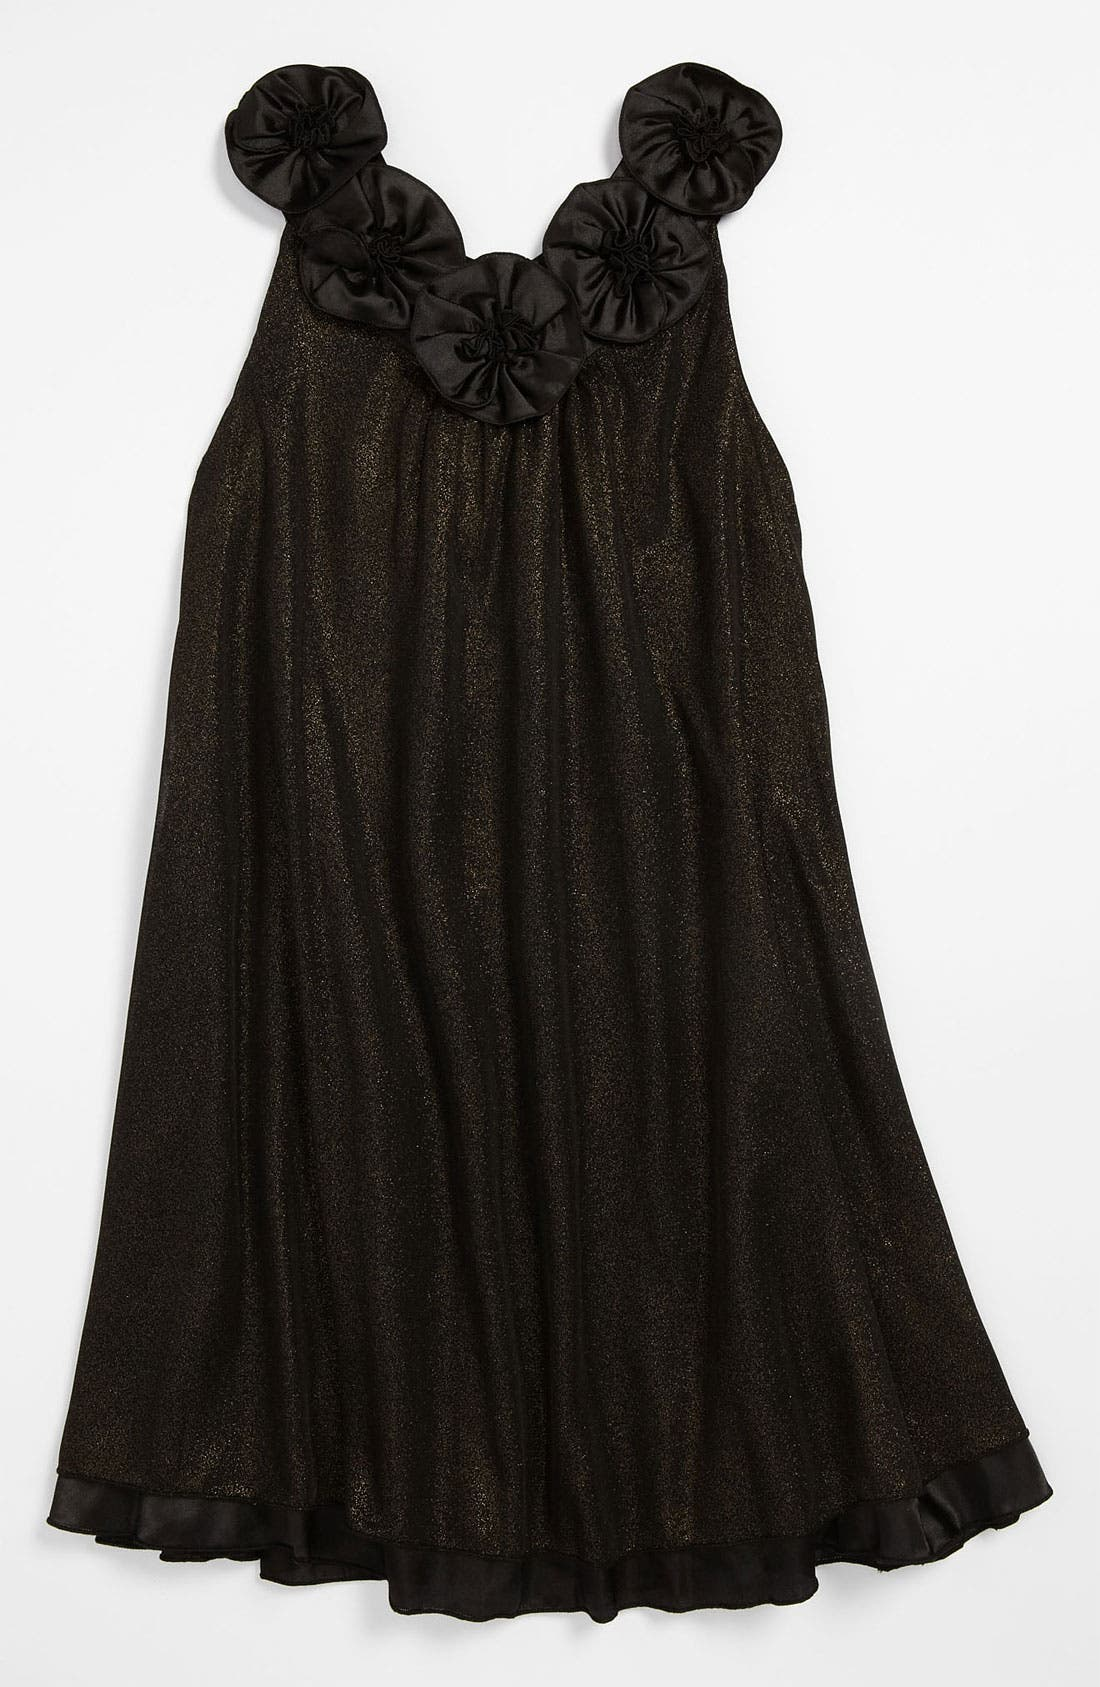 Alternate Image 1 Selected - Laundry by Shelli Segal 'Diana' Glitter Dress (Big Girls)